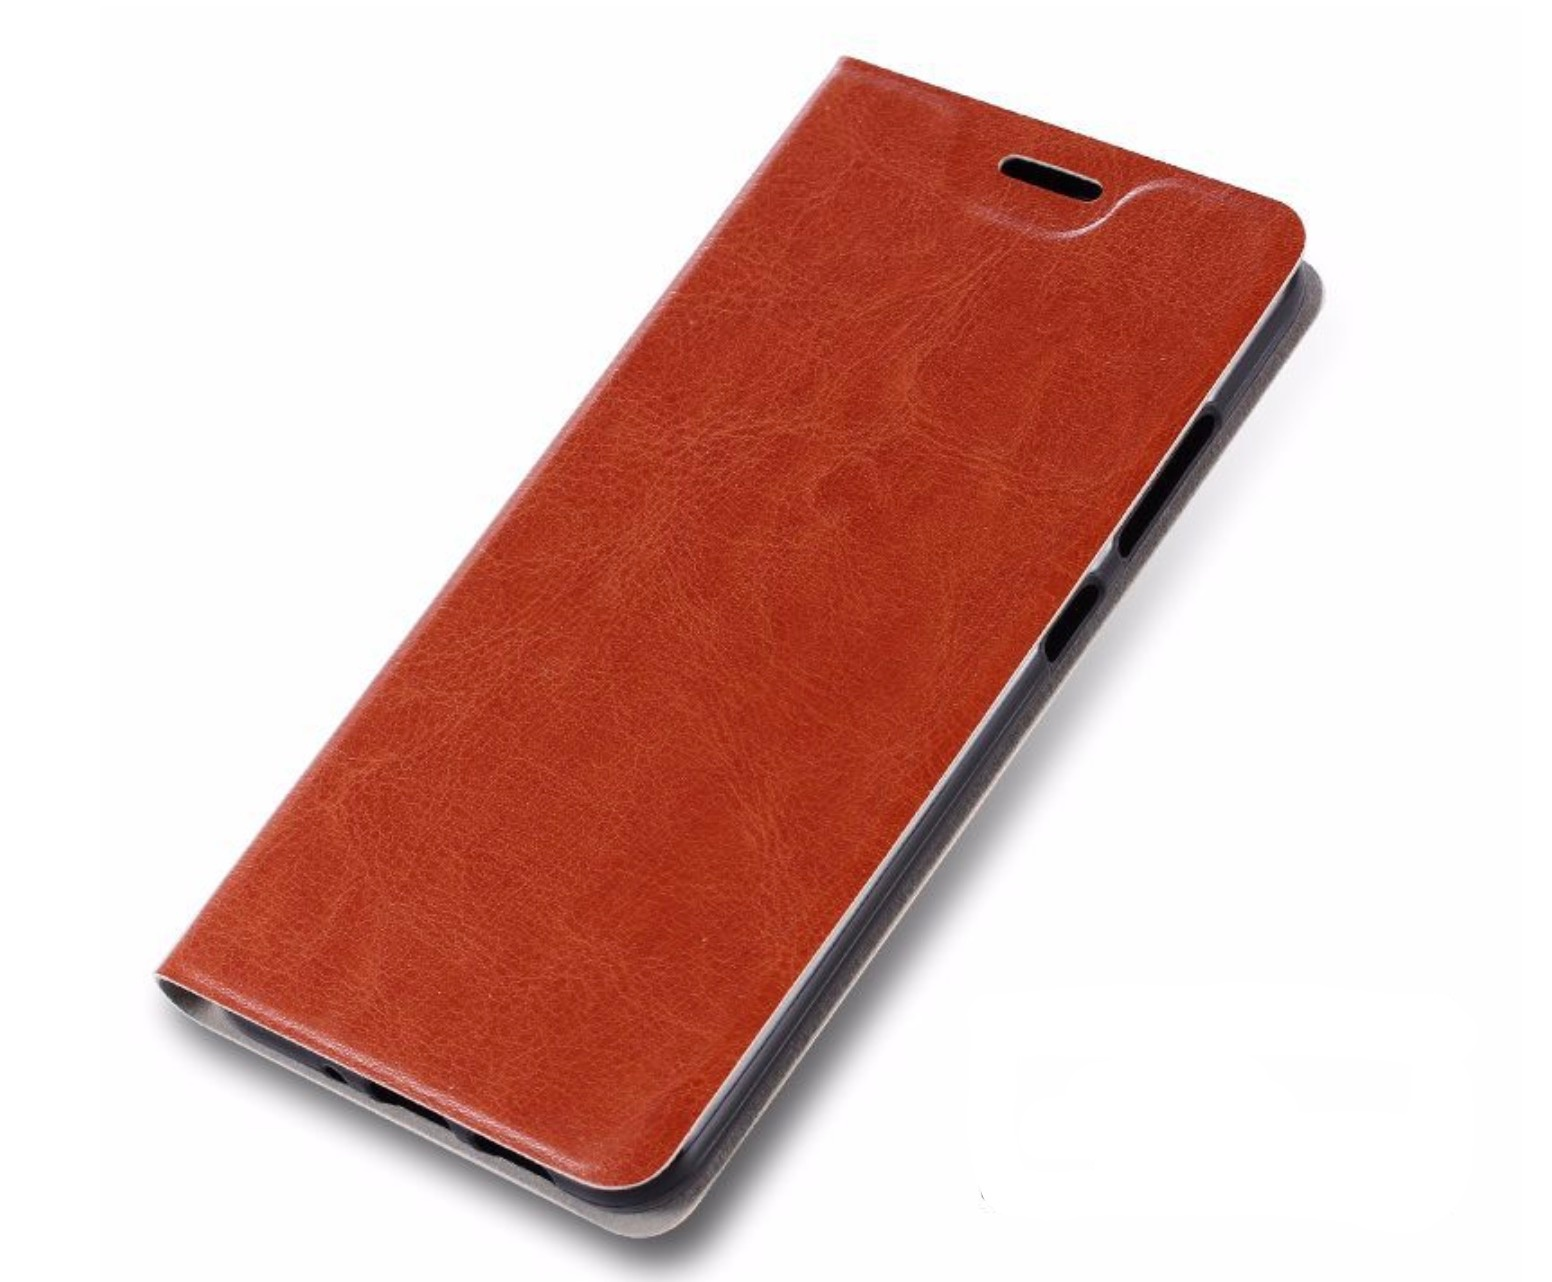 Фото - Чехол-книжка MyPads для ZTE Nubia Z11 Mini на жёсткой металлической основе коричневый zte nubia z11 mini nx529j 5 0 fhd android 5 1 smartphone black